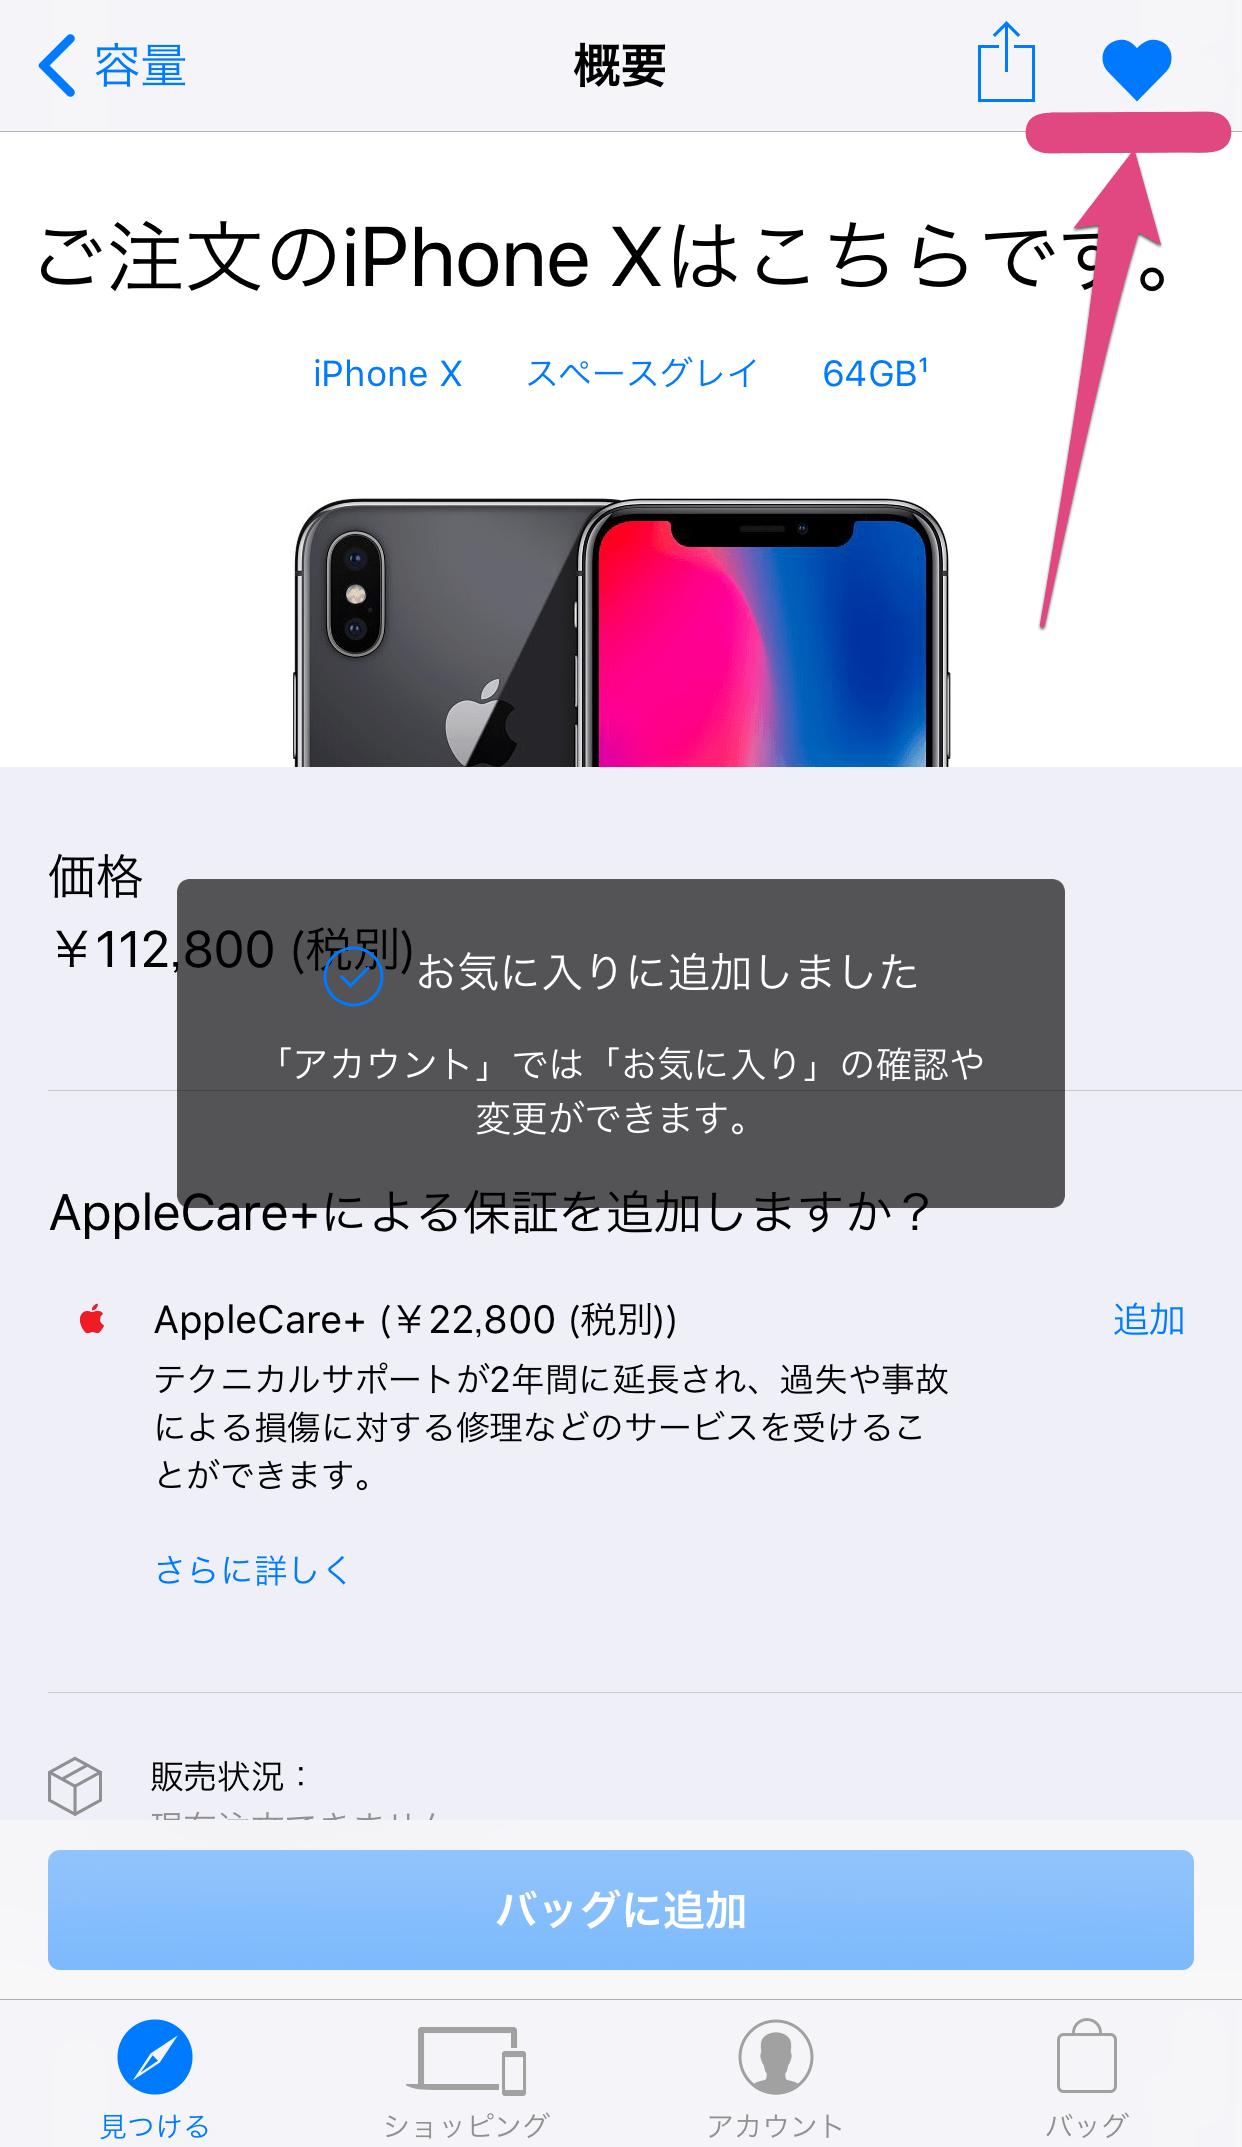 IPhoneX AppStoreYoyaku 06